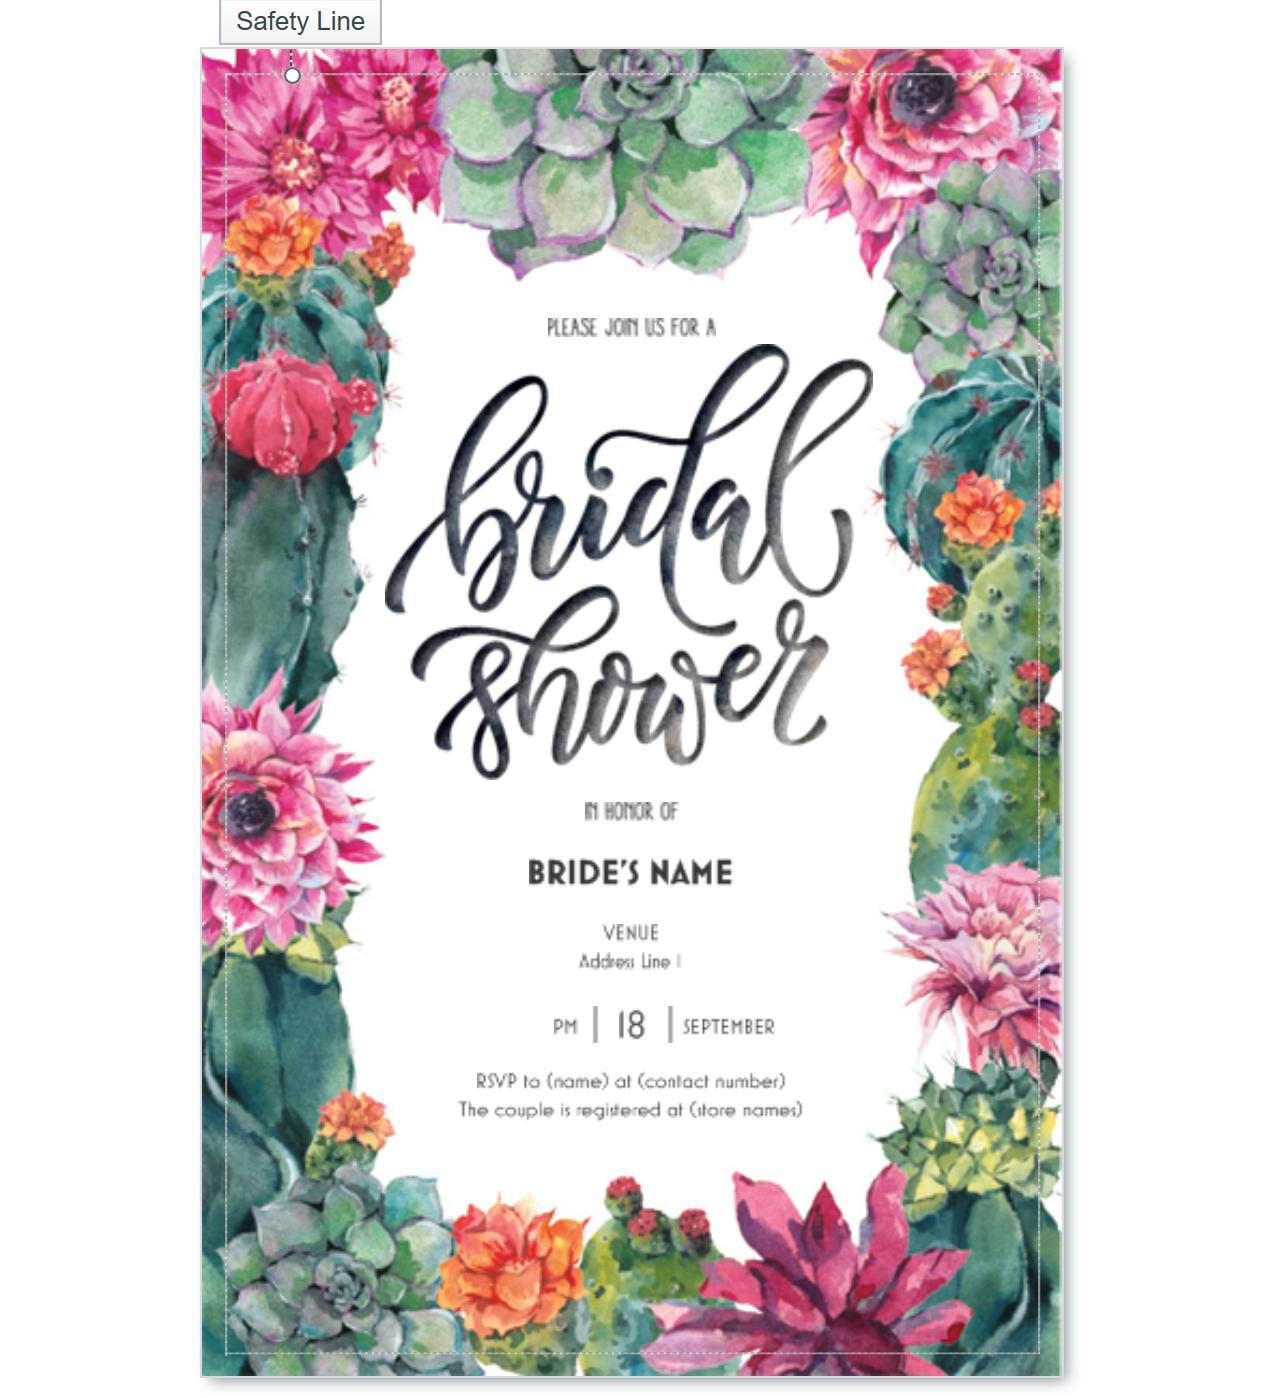 Floral bridal shower invite vistaprint bp pinterest bridal floral bridal shower invite vistaprint filmwisefo Image collections